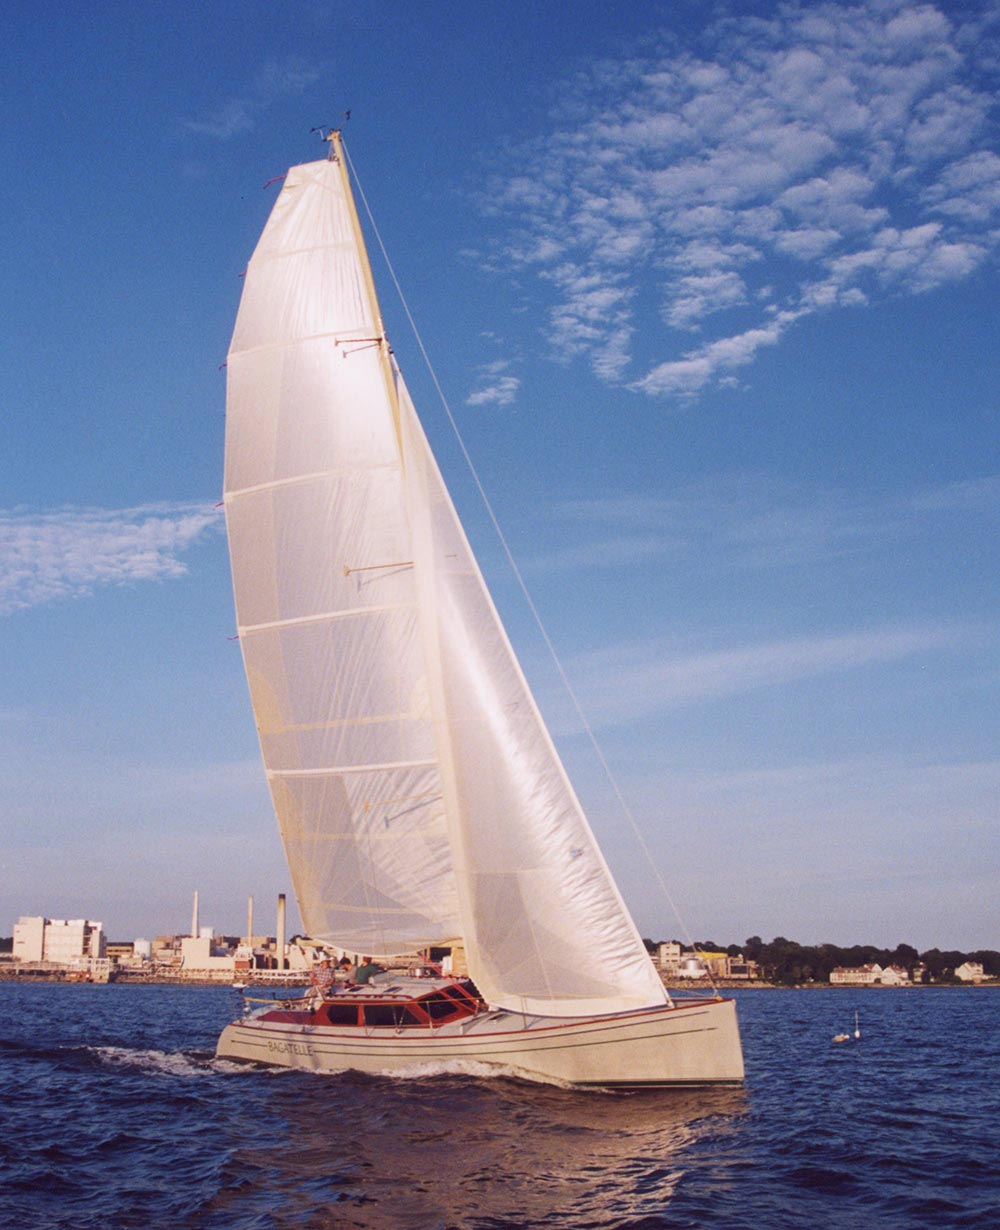 bagatelle-sailing